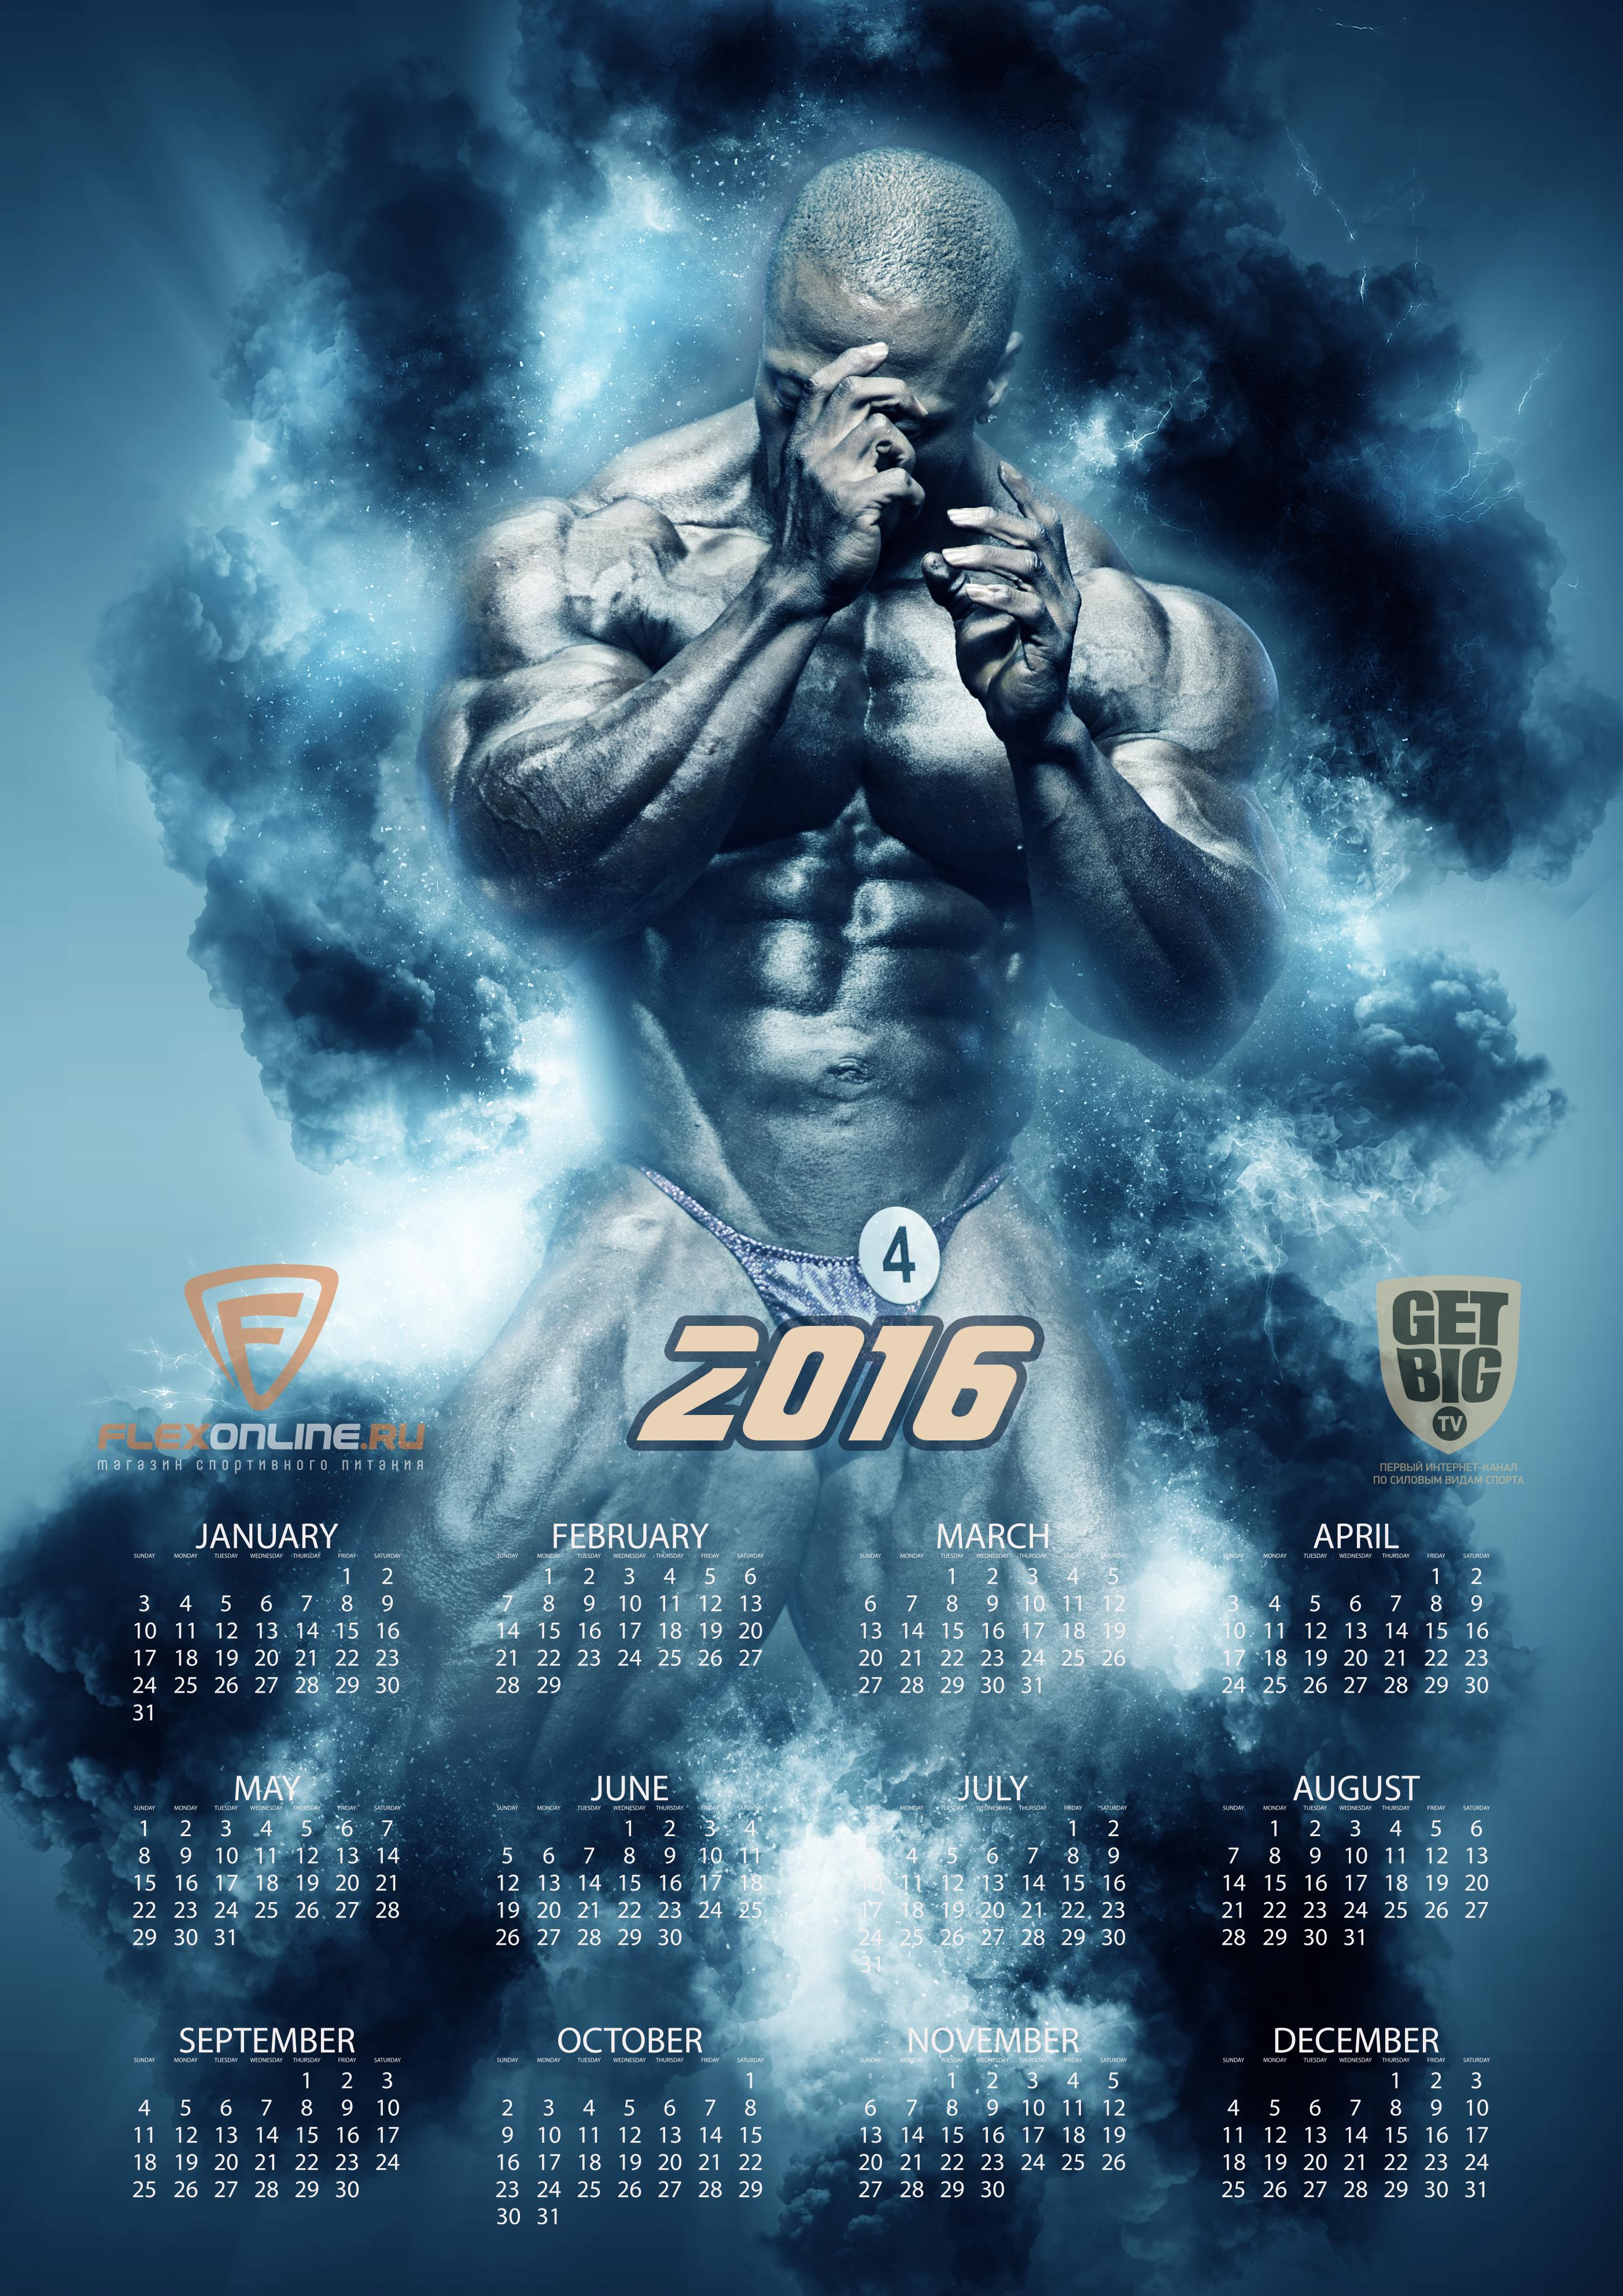 Календарь на 2016 год [Шон Роден]